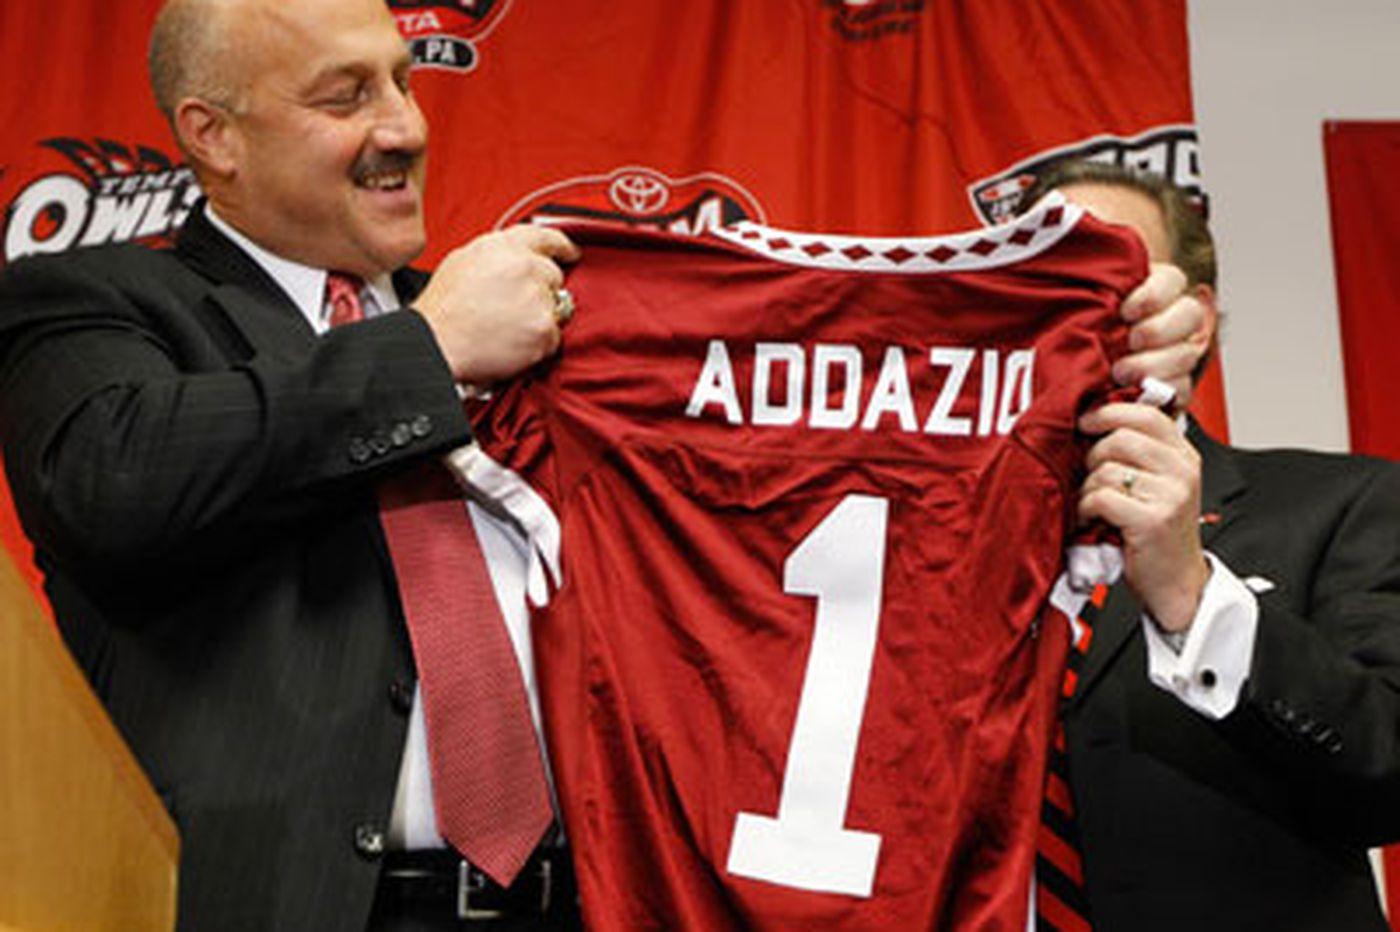 Steve Addazio takes over as Temple football coach